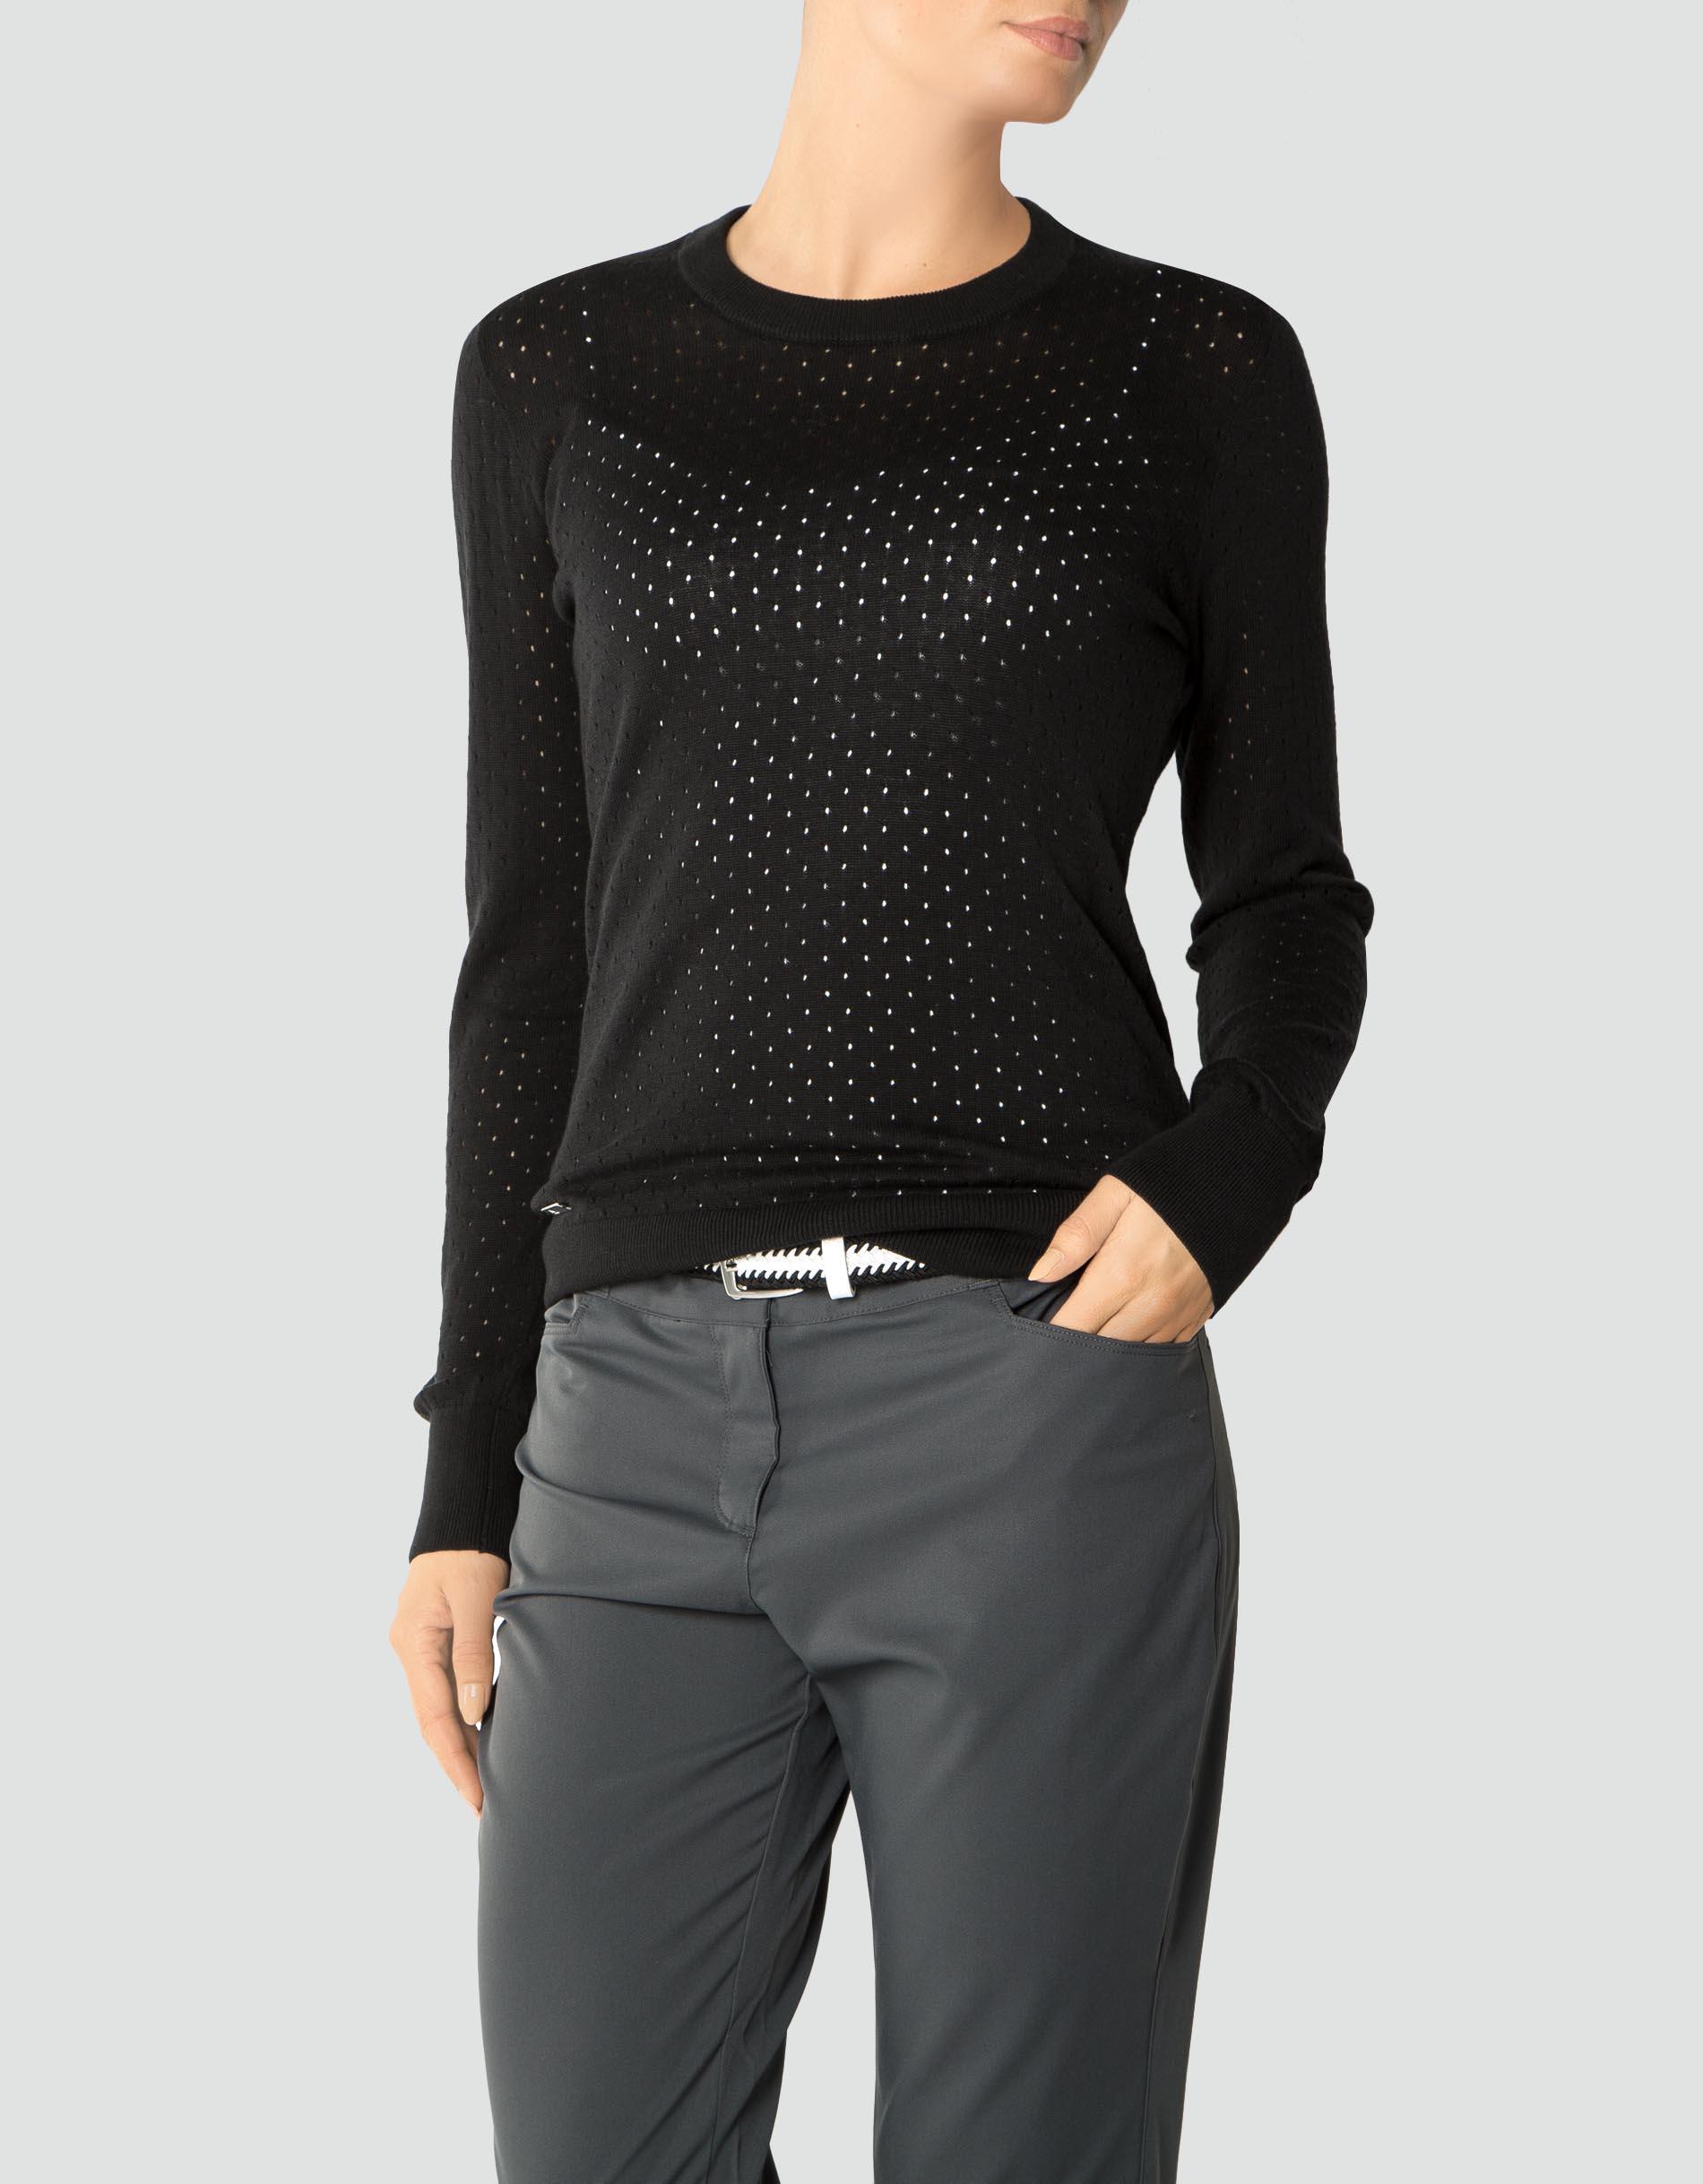 adidas golf damen pullover black mit allover lochmuster. Black Bedroom Furniture Sets. Home Design Ideas